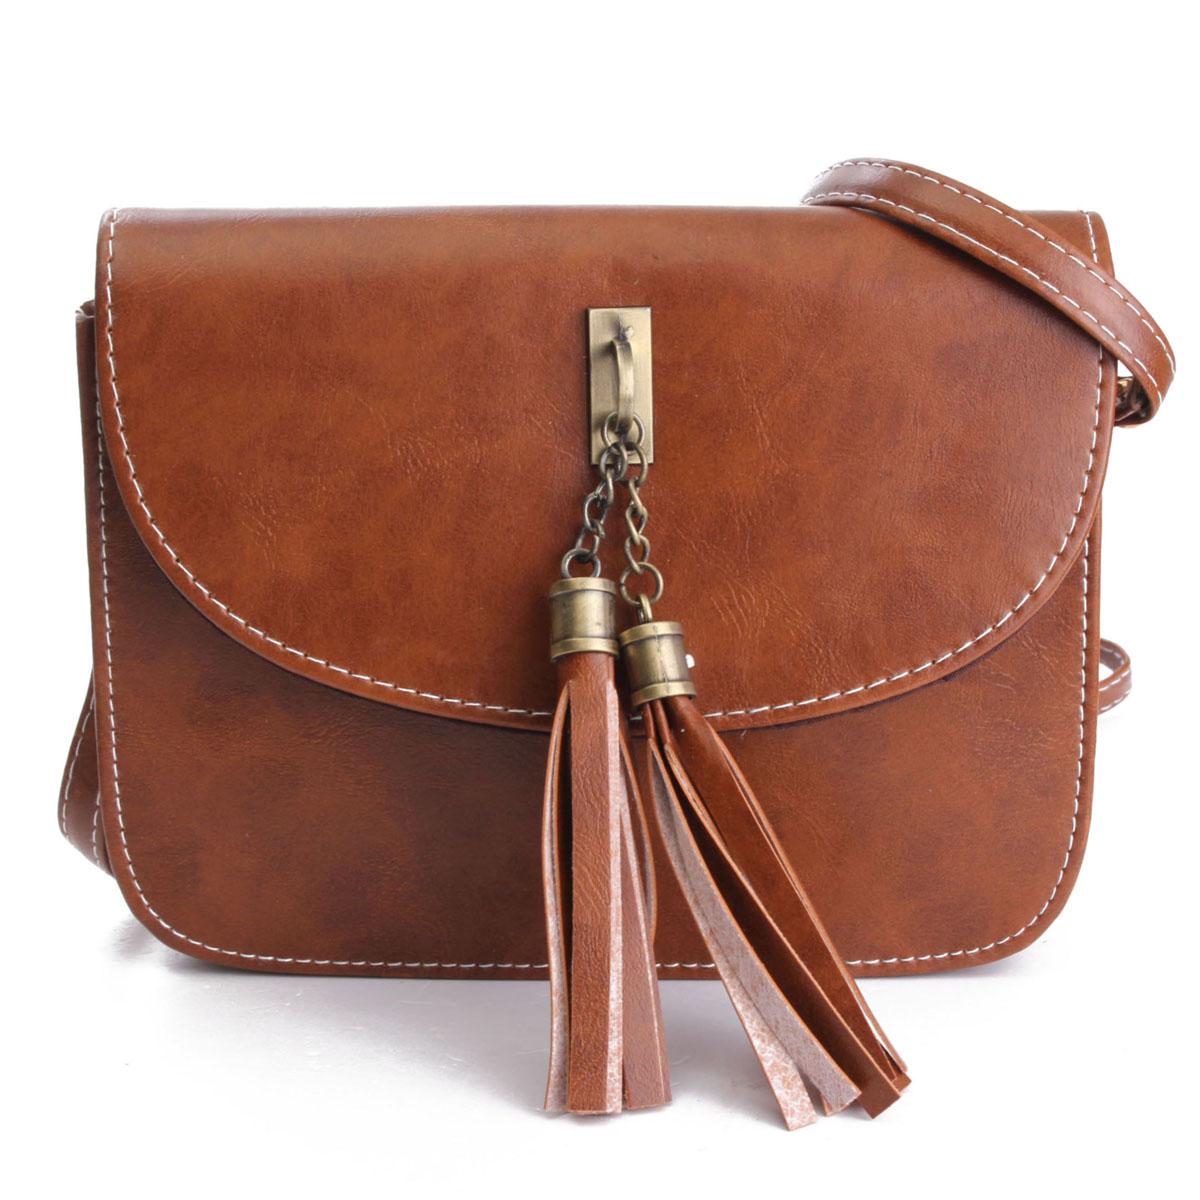 HOT Women Tassel Shoulder Bag Handbag Purse Satchel Messenger Crossbody Tote